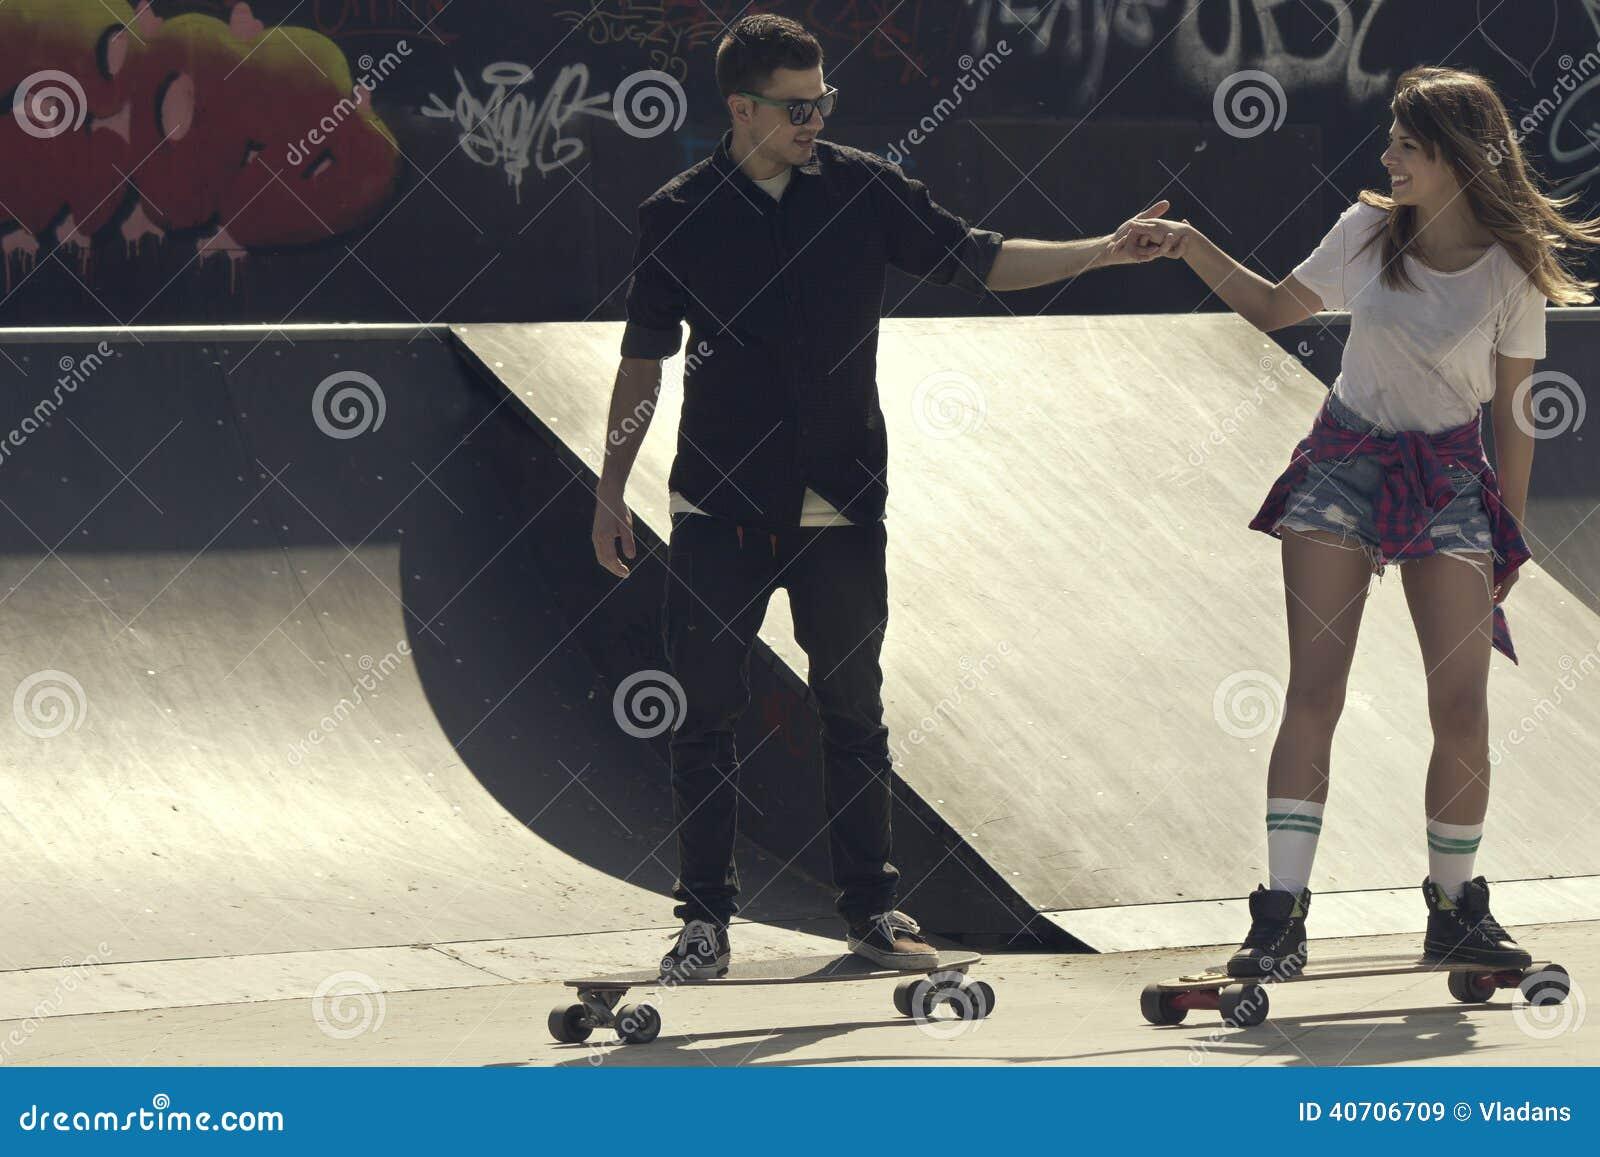 Skateboard couple